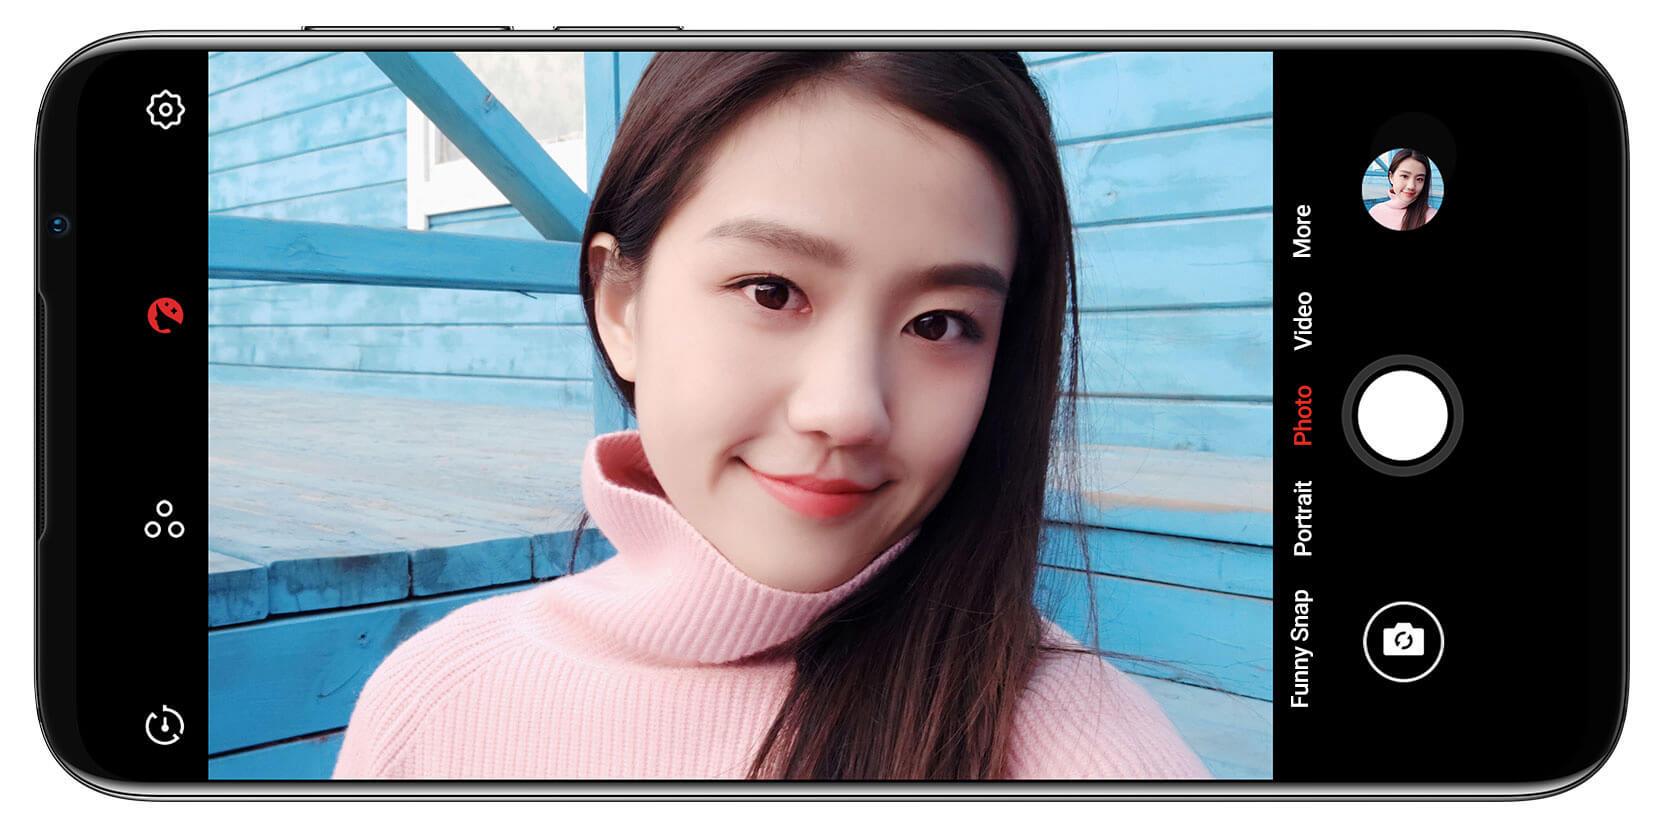 Meizu 16s cámara selfie